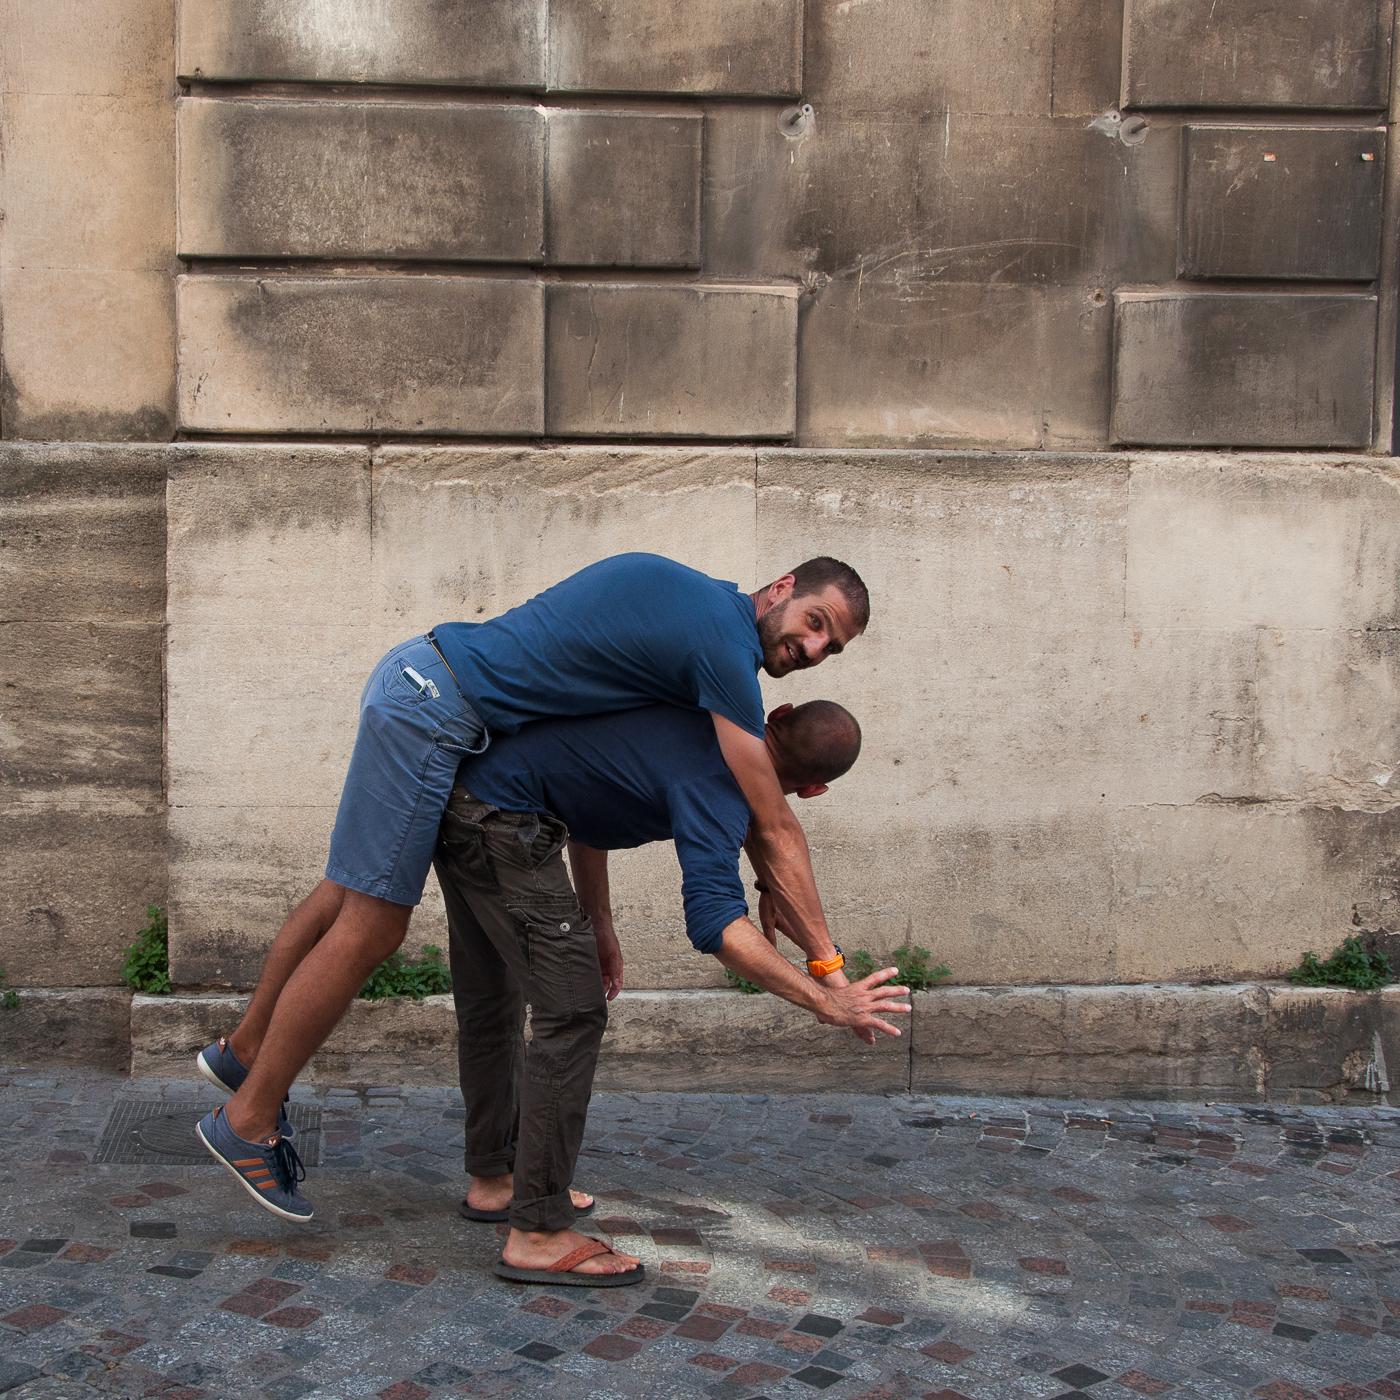 Arles 2015 - Sur le dos